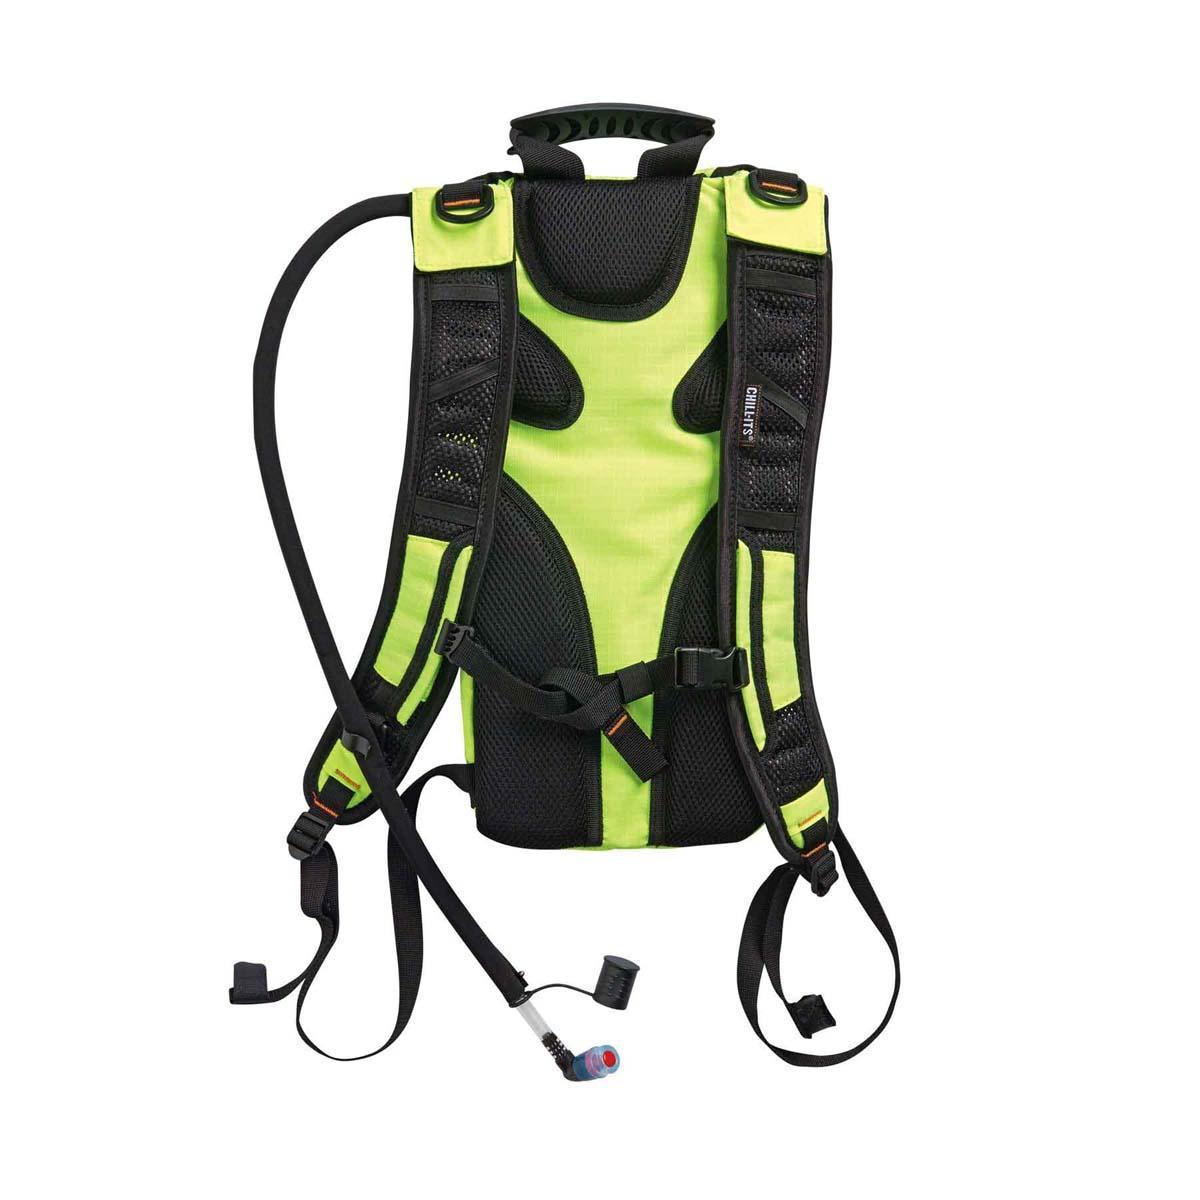 5156 3 ltr Hi-Vis Lime Premium Low Profile Hydration Pack